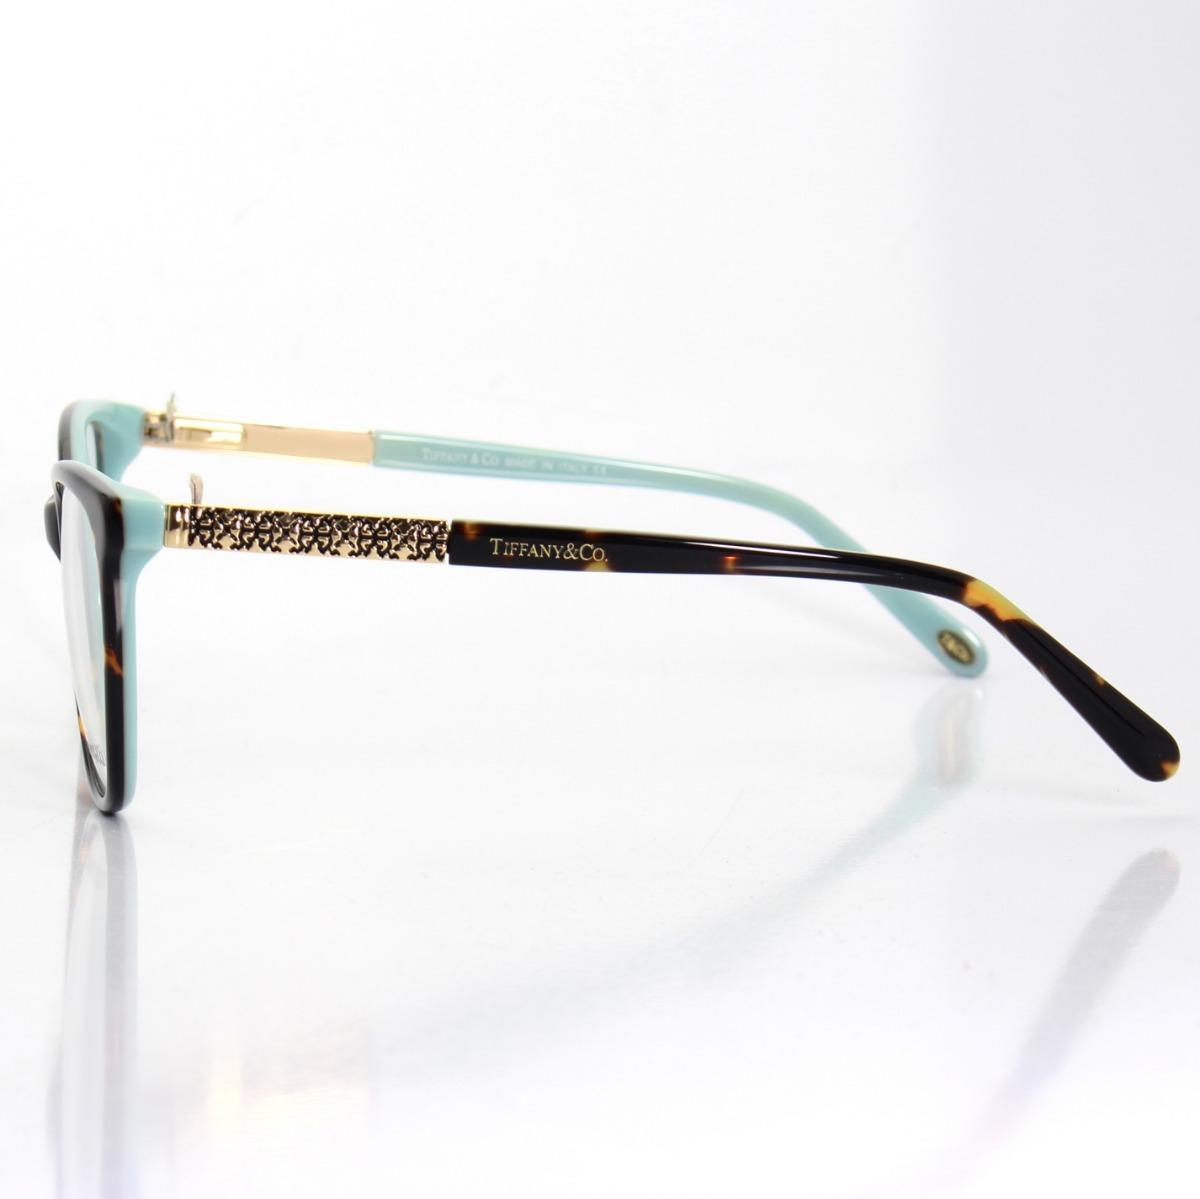 ... grau tiffany   co. tf2099 kit azul. Carregando zoom... armação oculos  tiffany. Carregando zoom. 7c9912534c